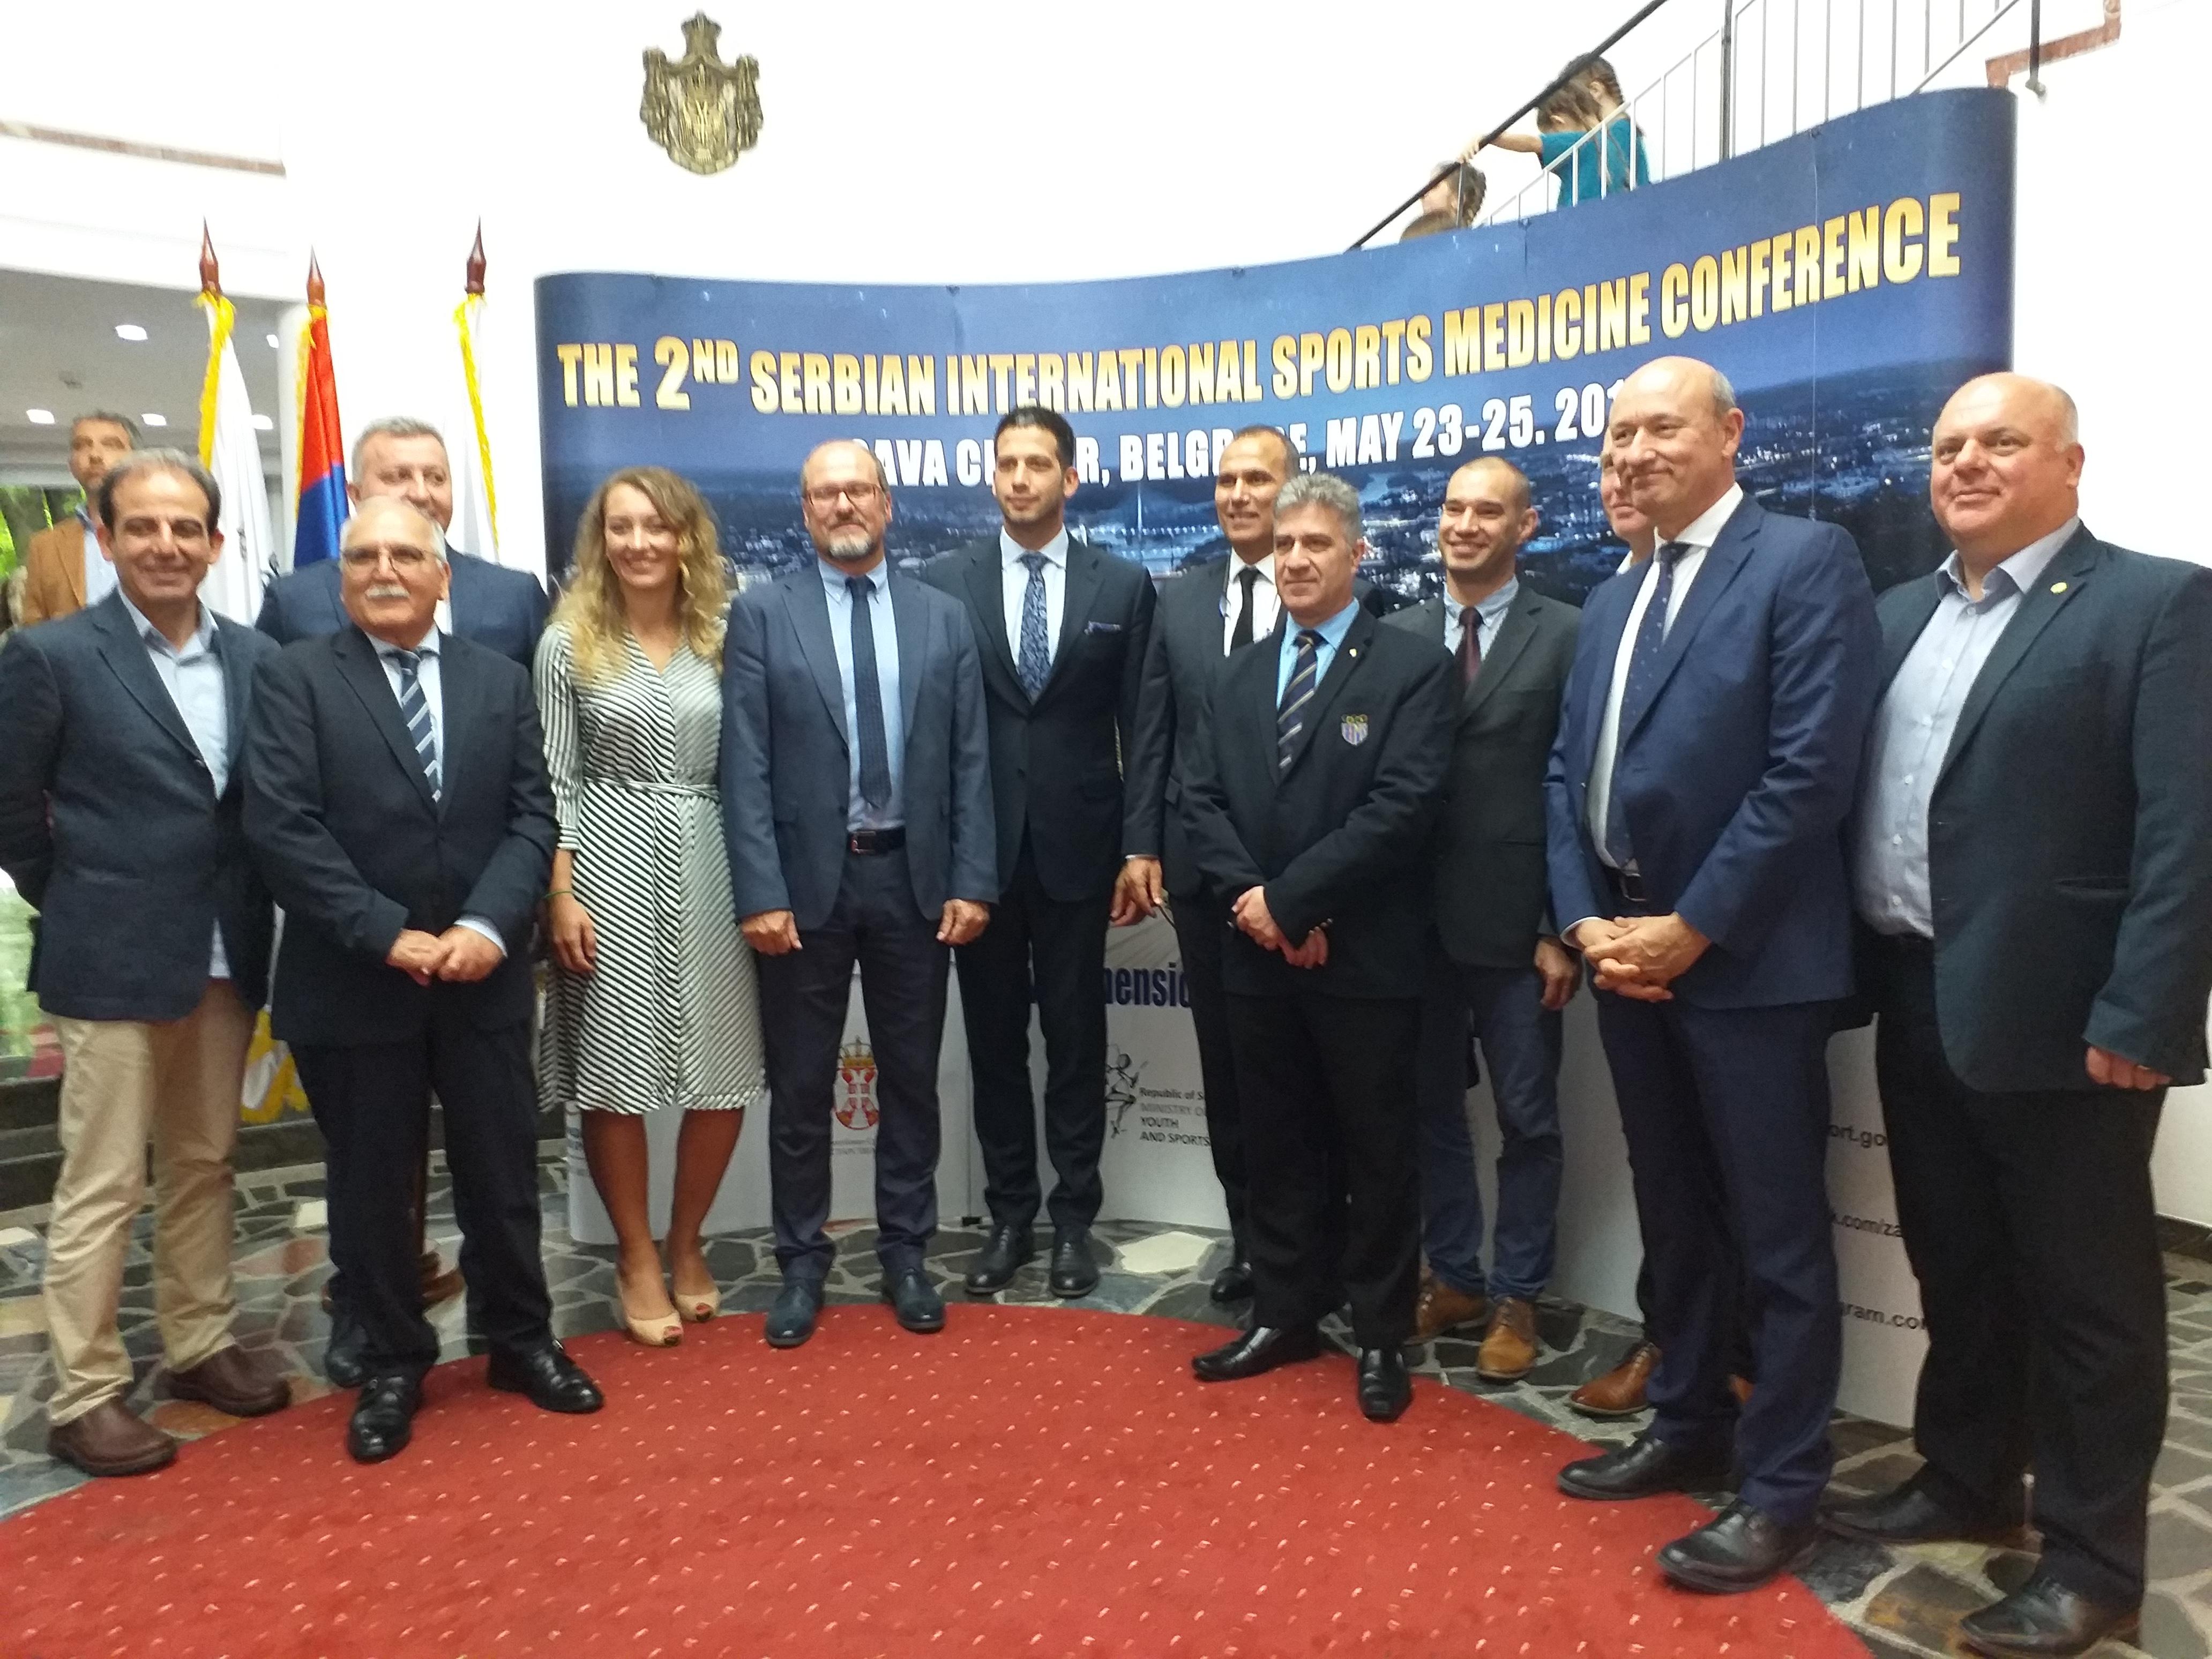 Београд центар медицине спорта - отворена 2. међународна конференција медицине спорта